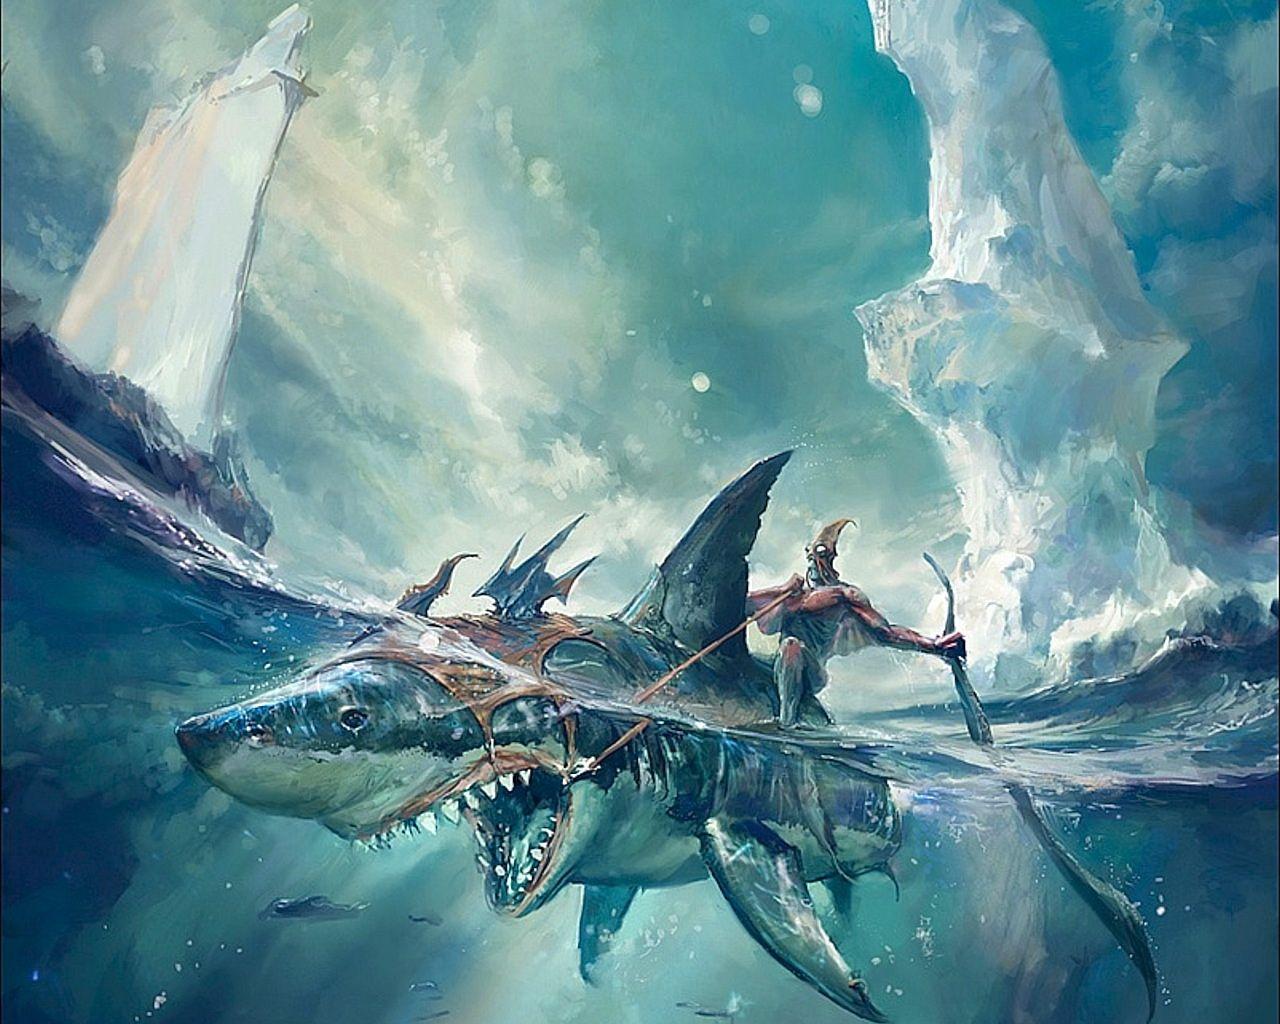 Cool Shark Wallpapers   Top Cool Shark Backgrounds 1280x1024